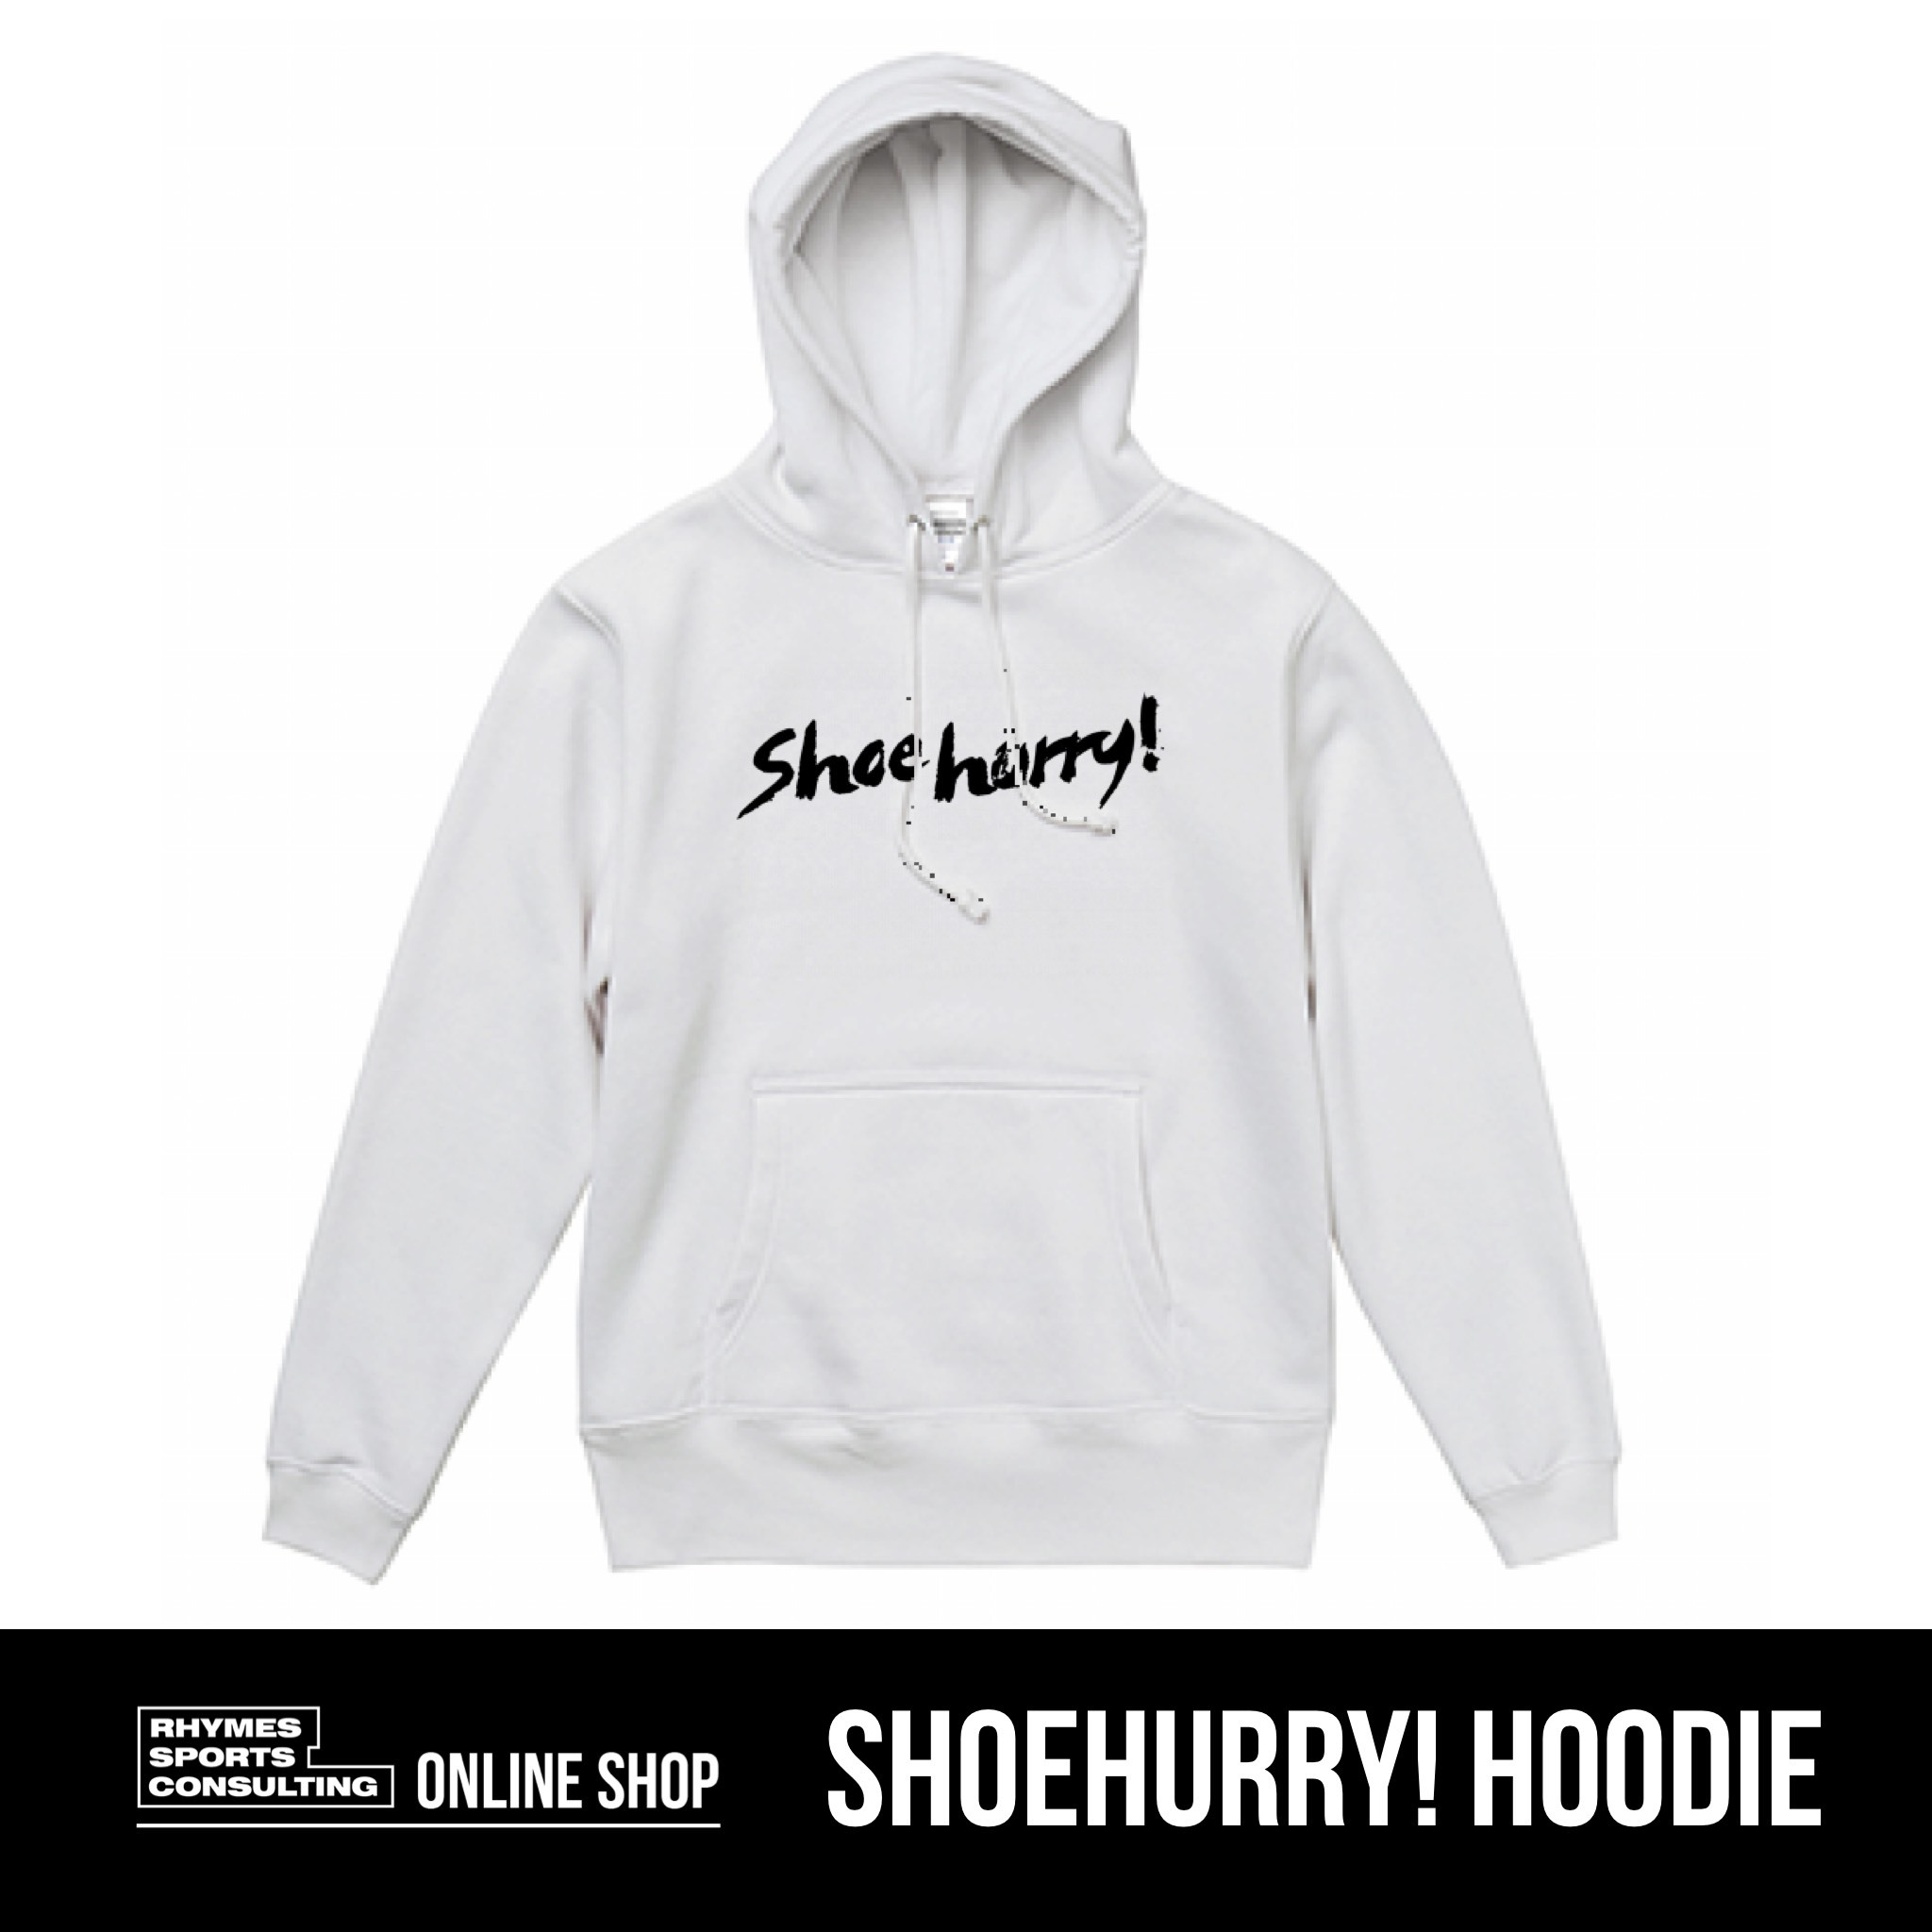 SHOEHURRY! 裏起毛フーディー(ホワイト×ブラック)